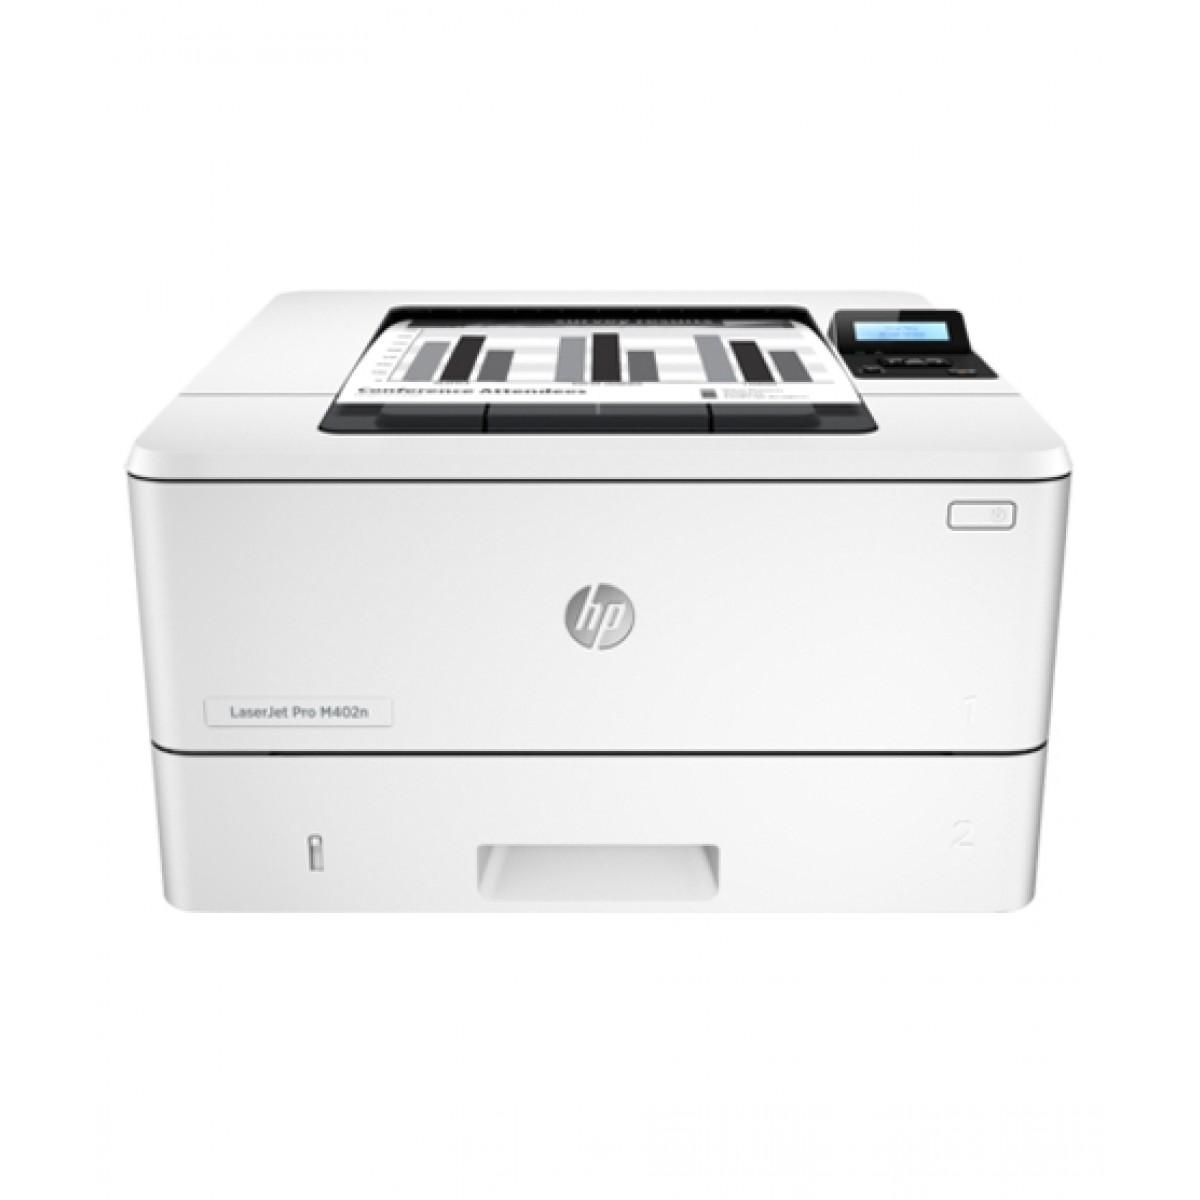 HP LaserJet Pro M402n Printer (C5F93A) - Without Warranty